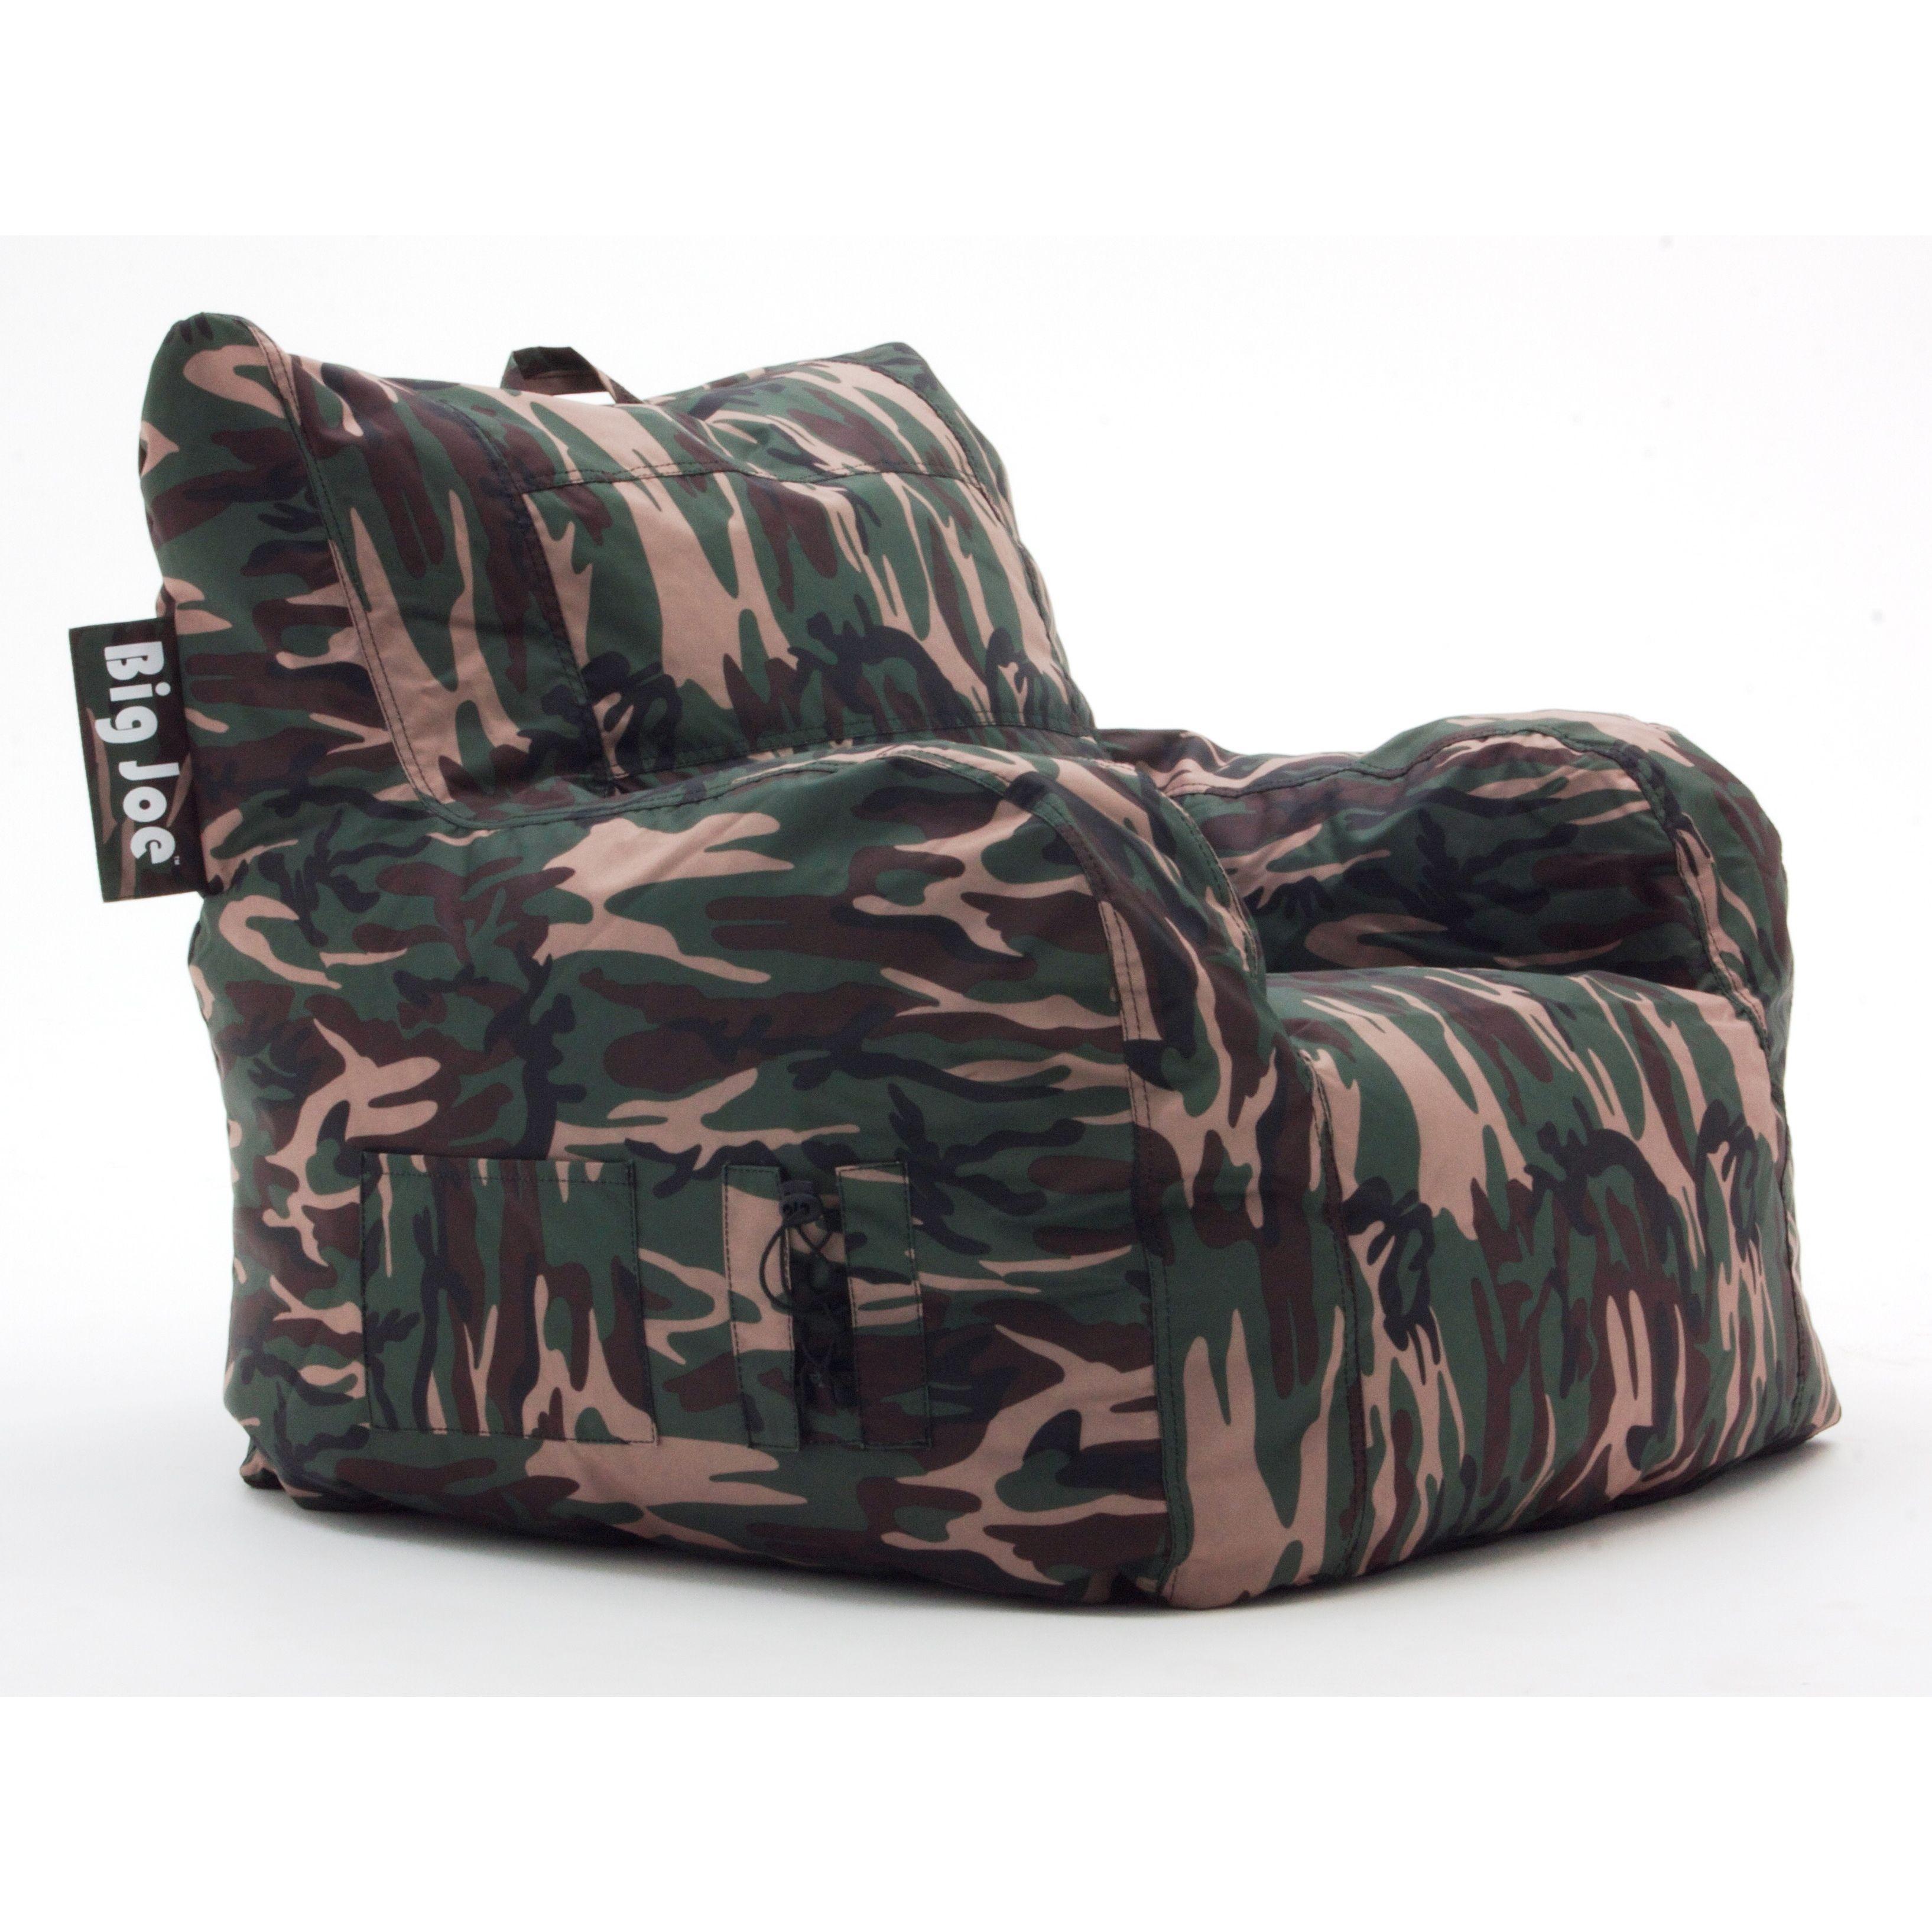 Cool Beansack Big Joe Camoflauge Lounge Chair Overstock Com Creativecarmelina Interior Chair Design Creativecarmelinacom